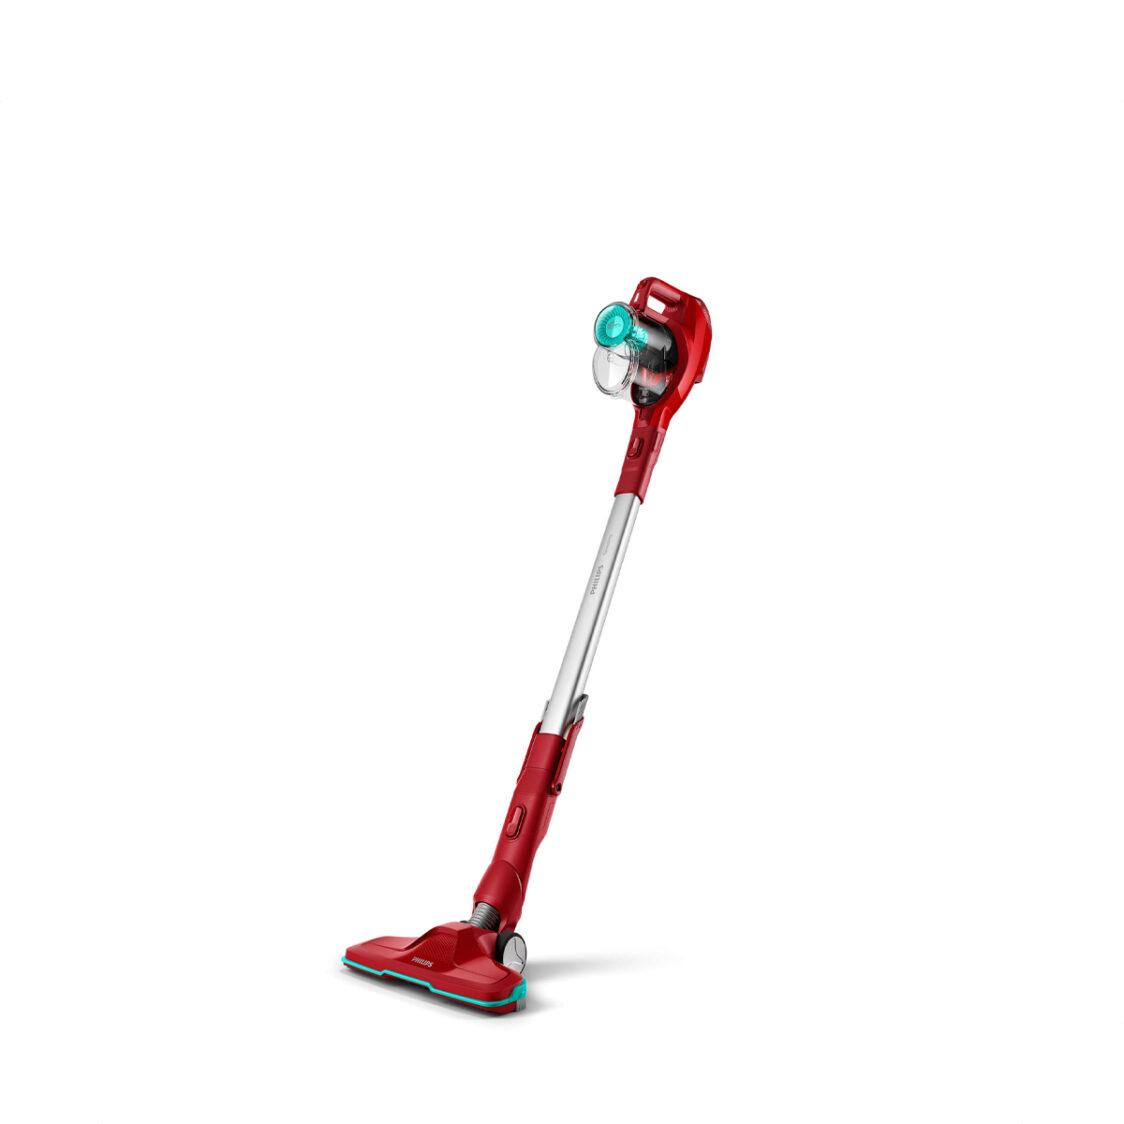 Philips Speed Pro Cordless 2-in-1 Handstick Vacuum Cleaner